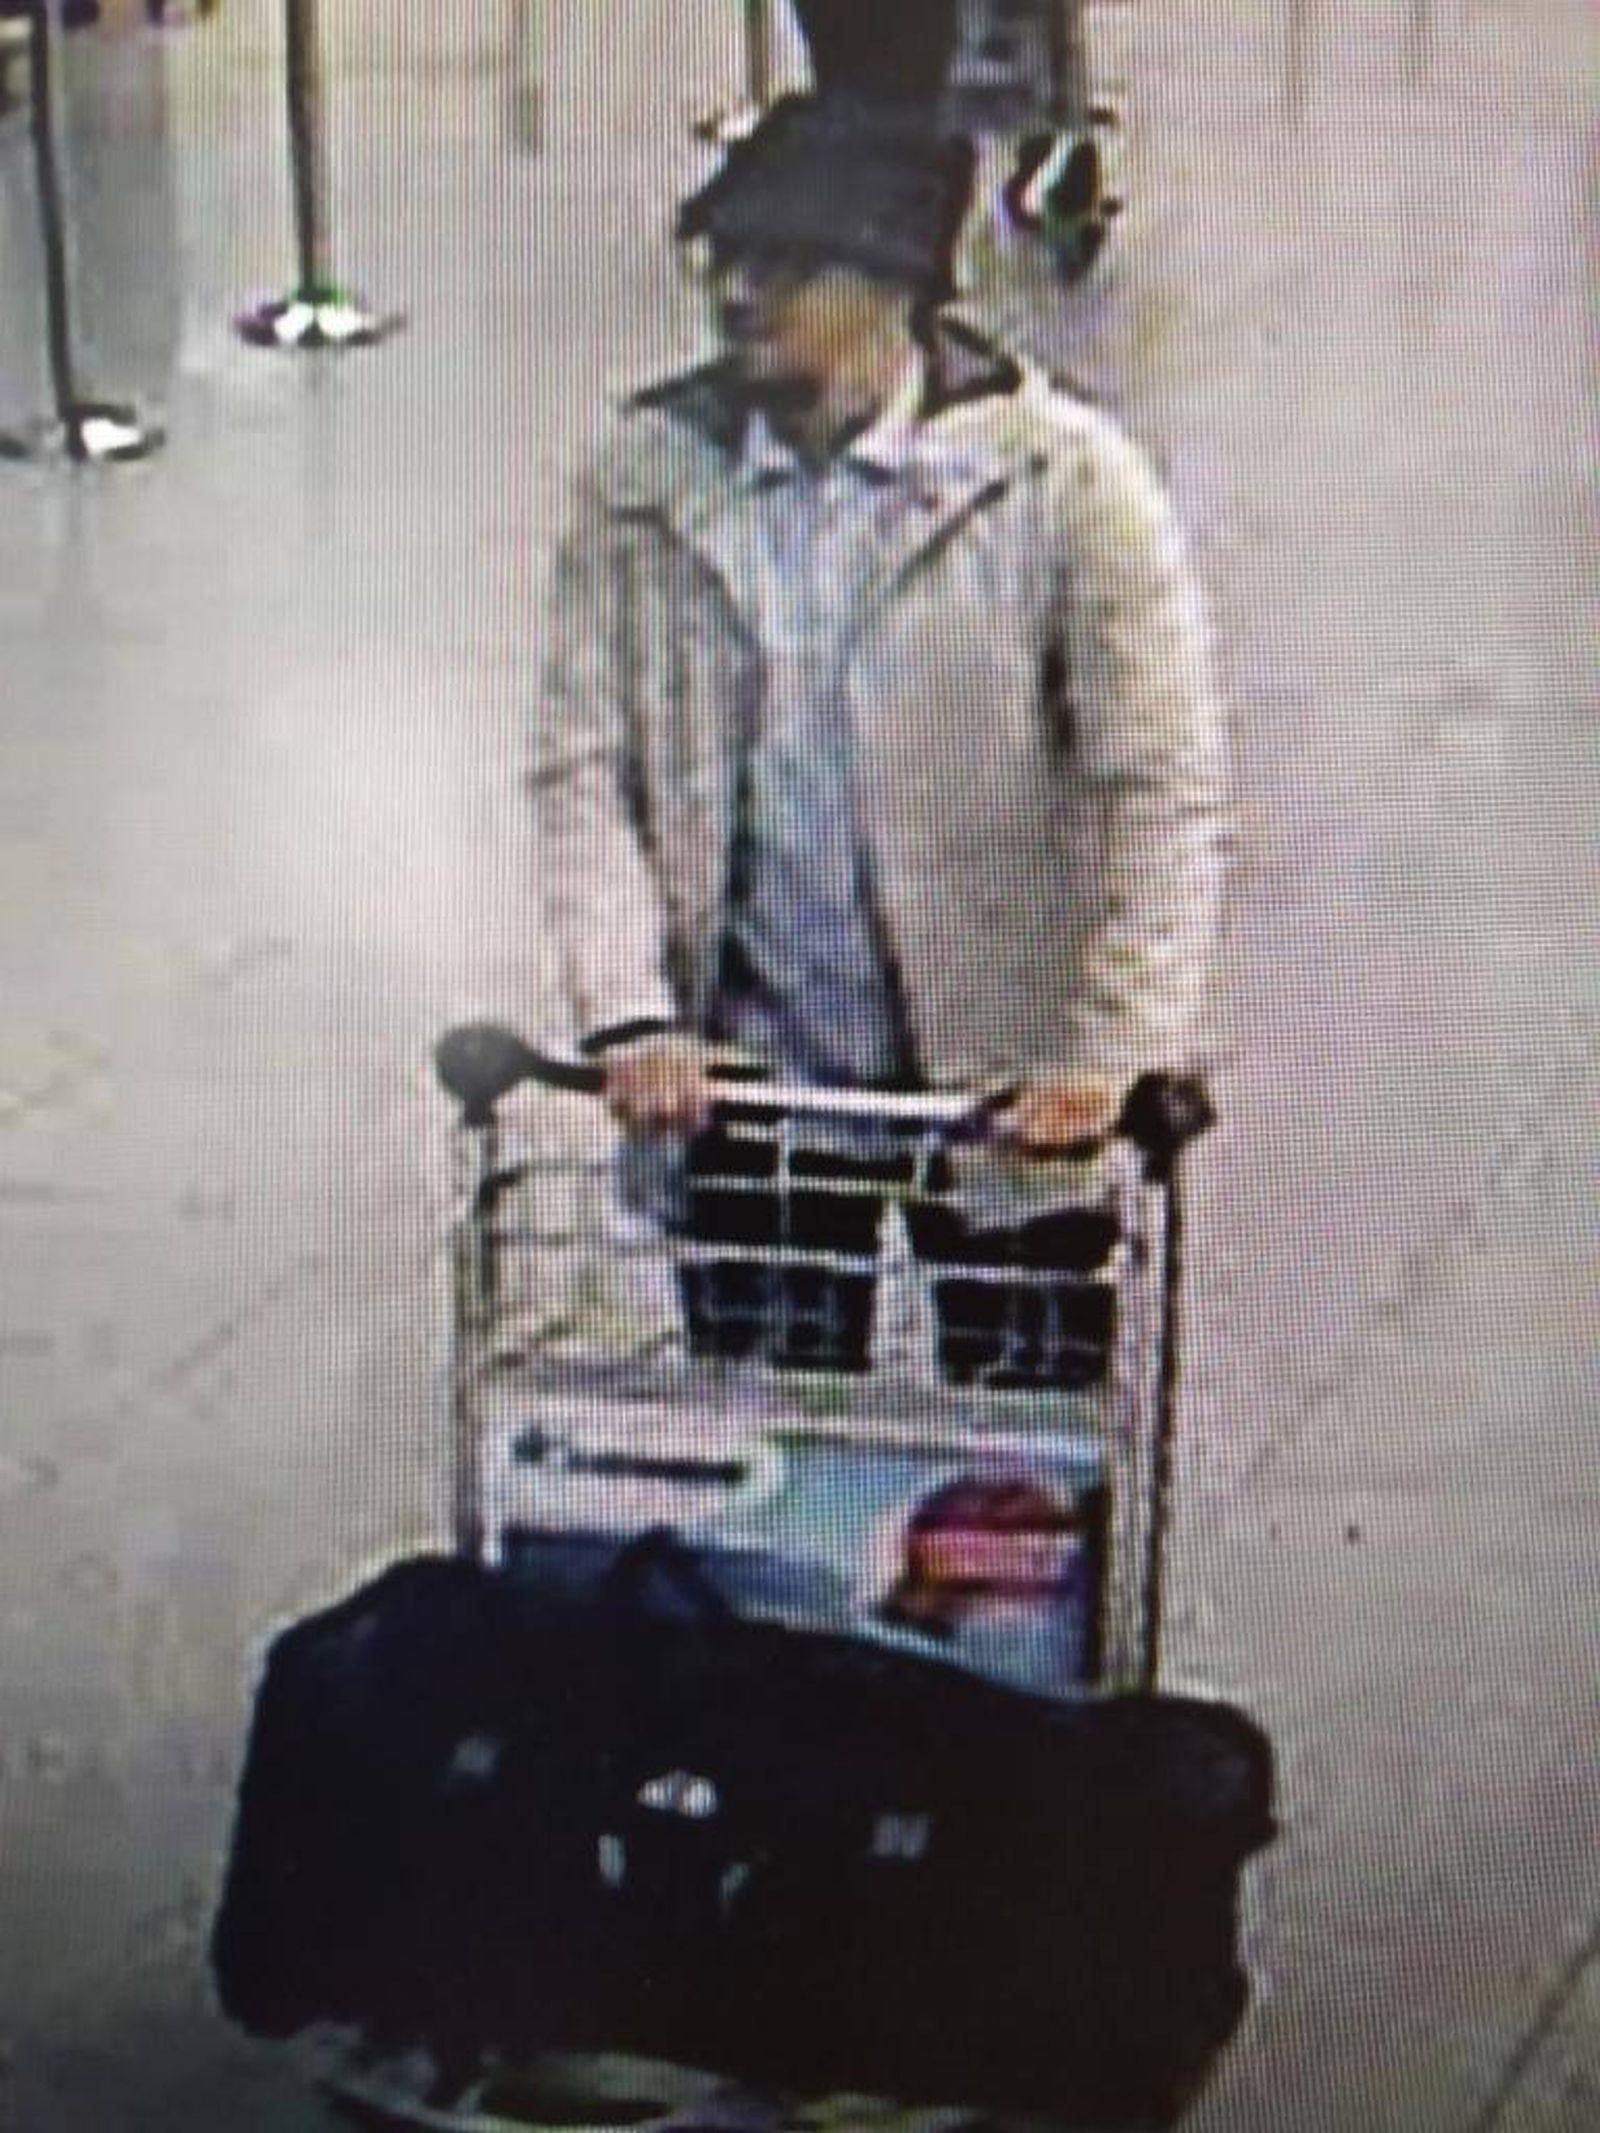 Belgien / Brüssel / Anschläge / Verdächtiger